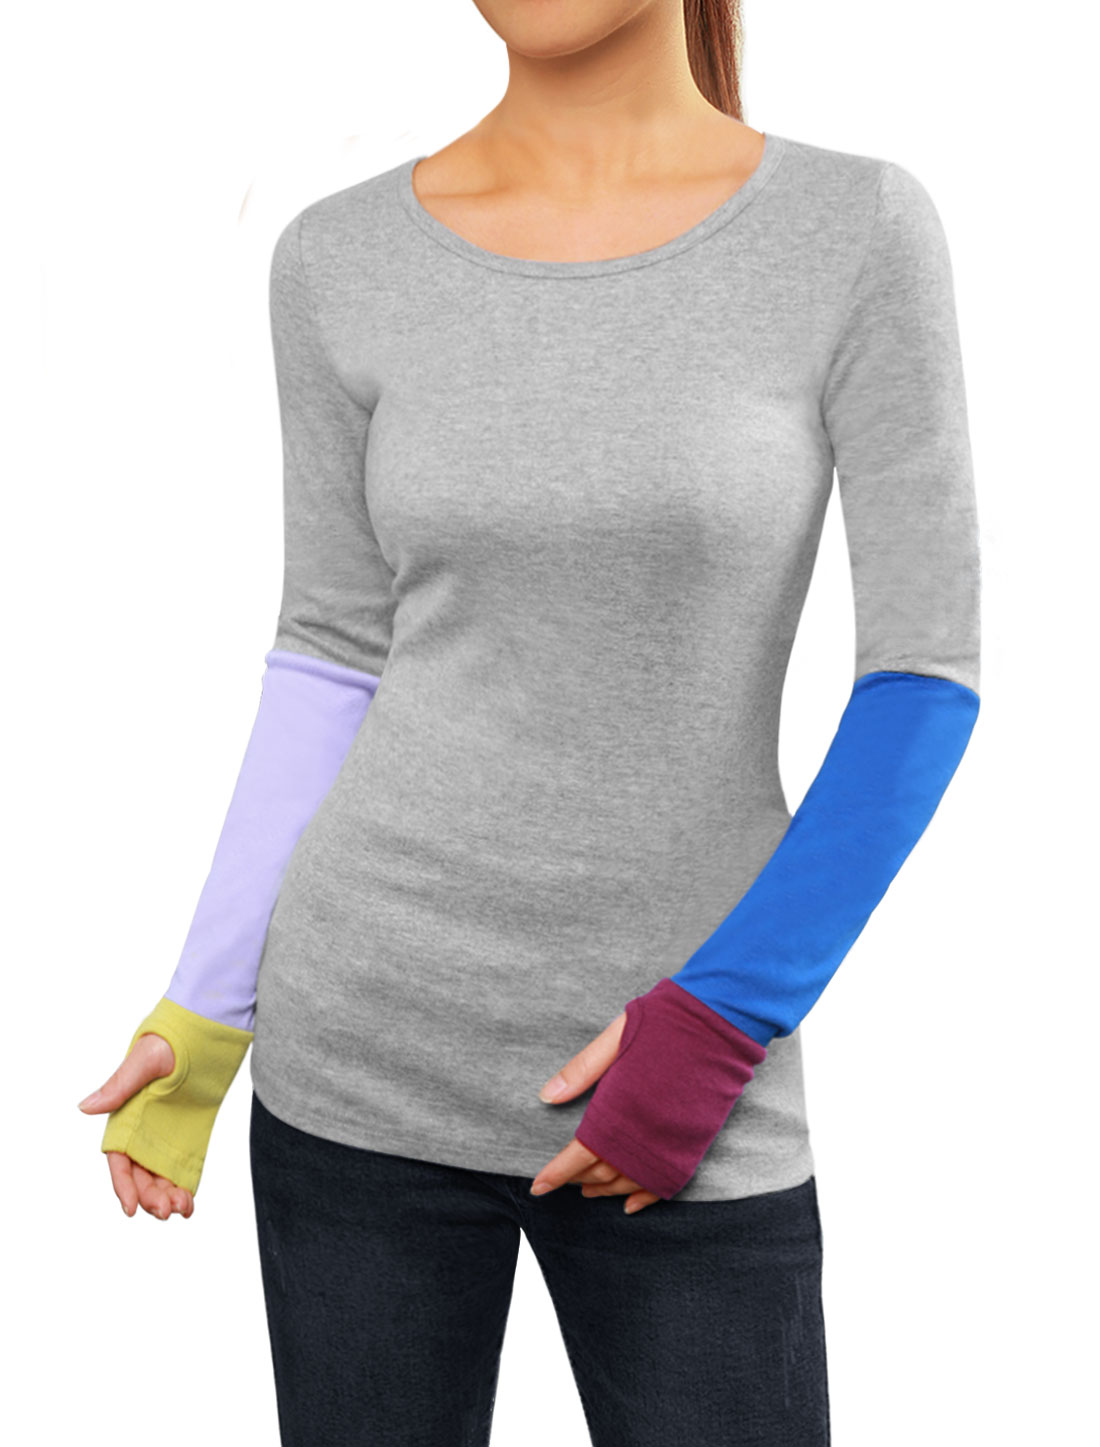 Woman Color Block Long Sleeves T-Shirt w Thumb Hole Gray S